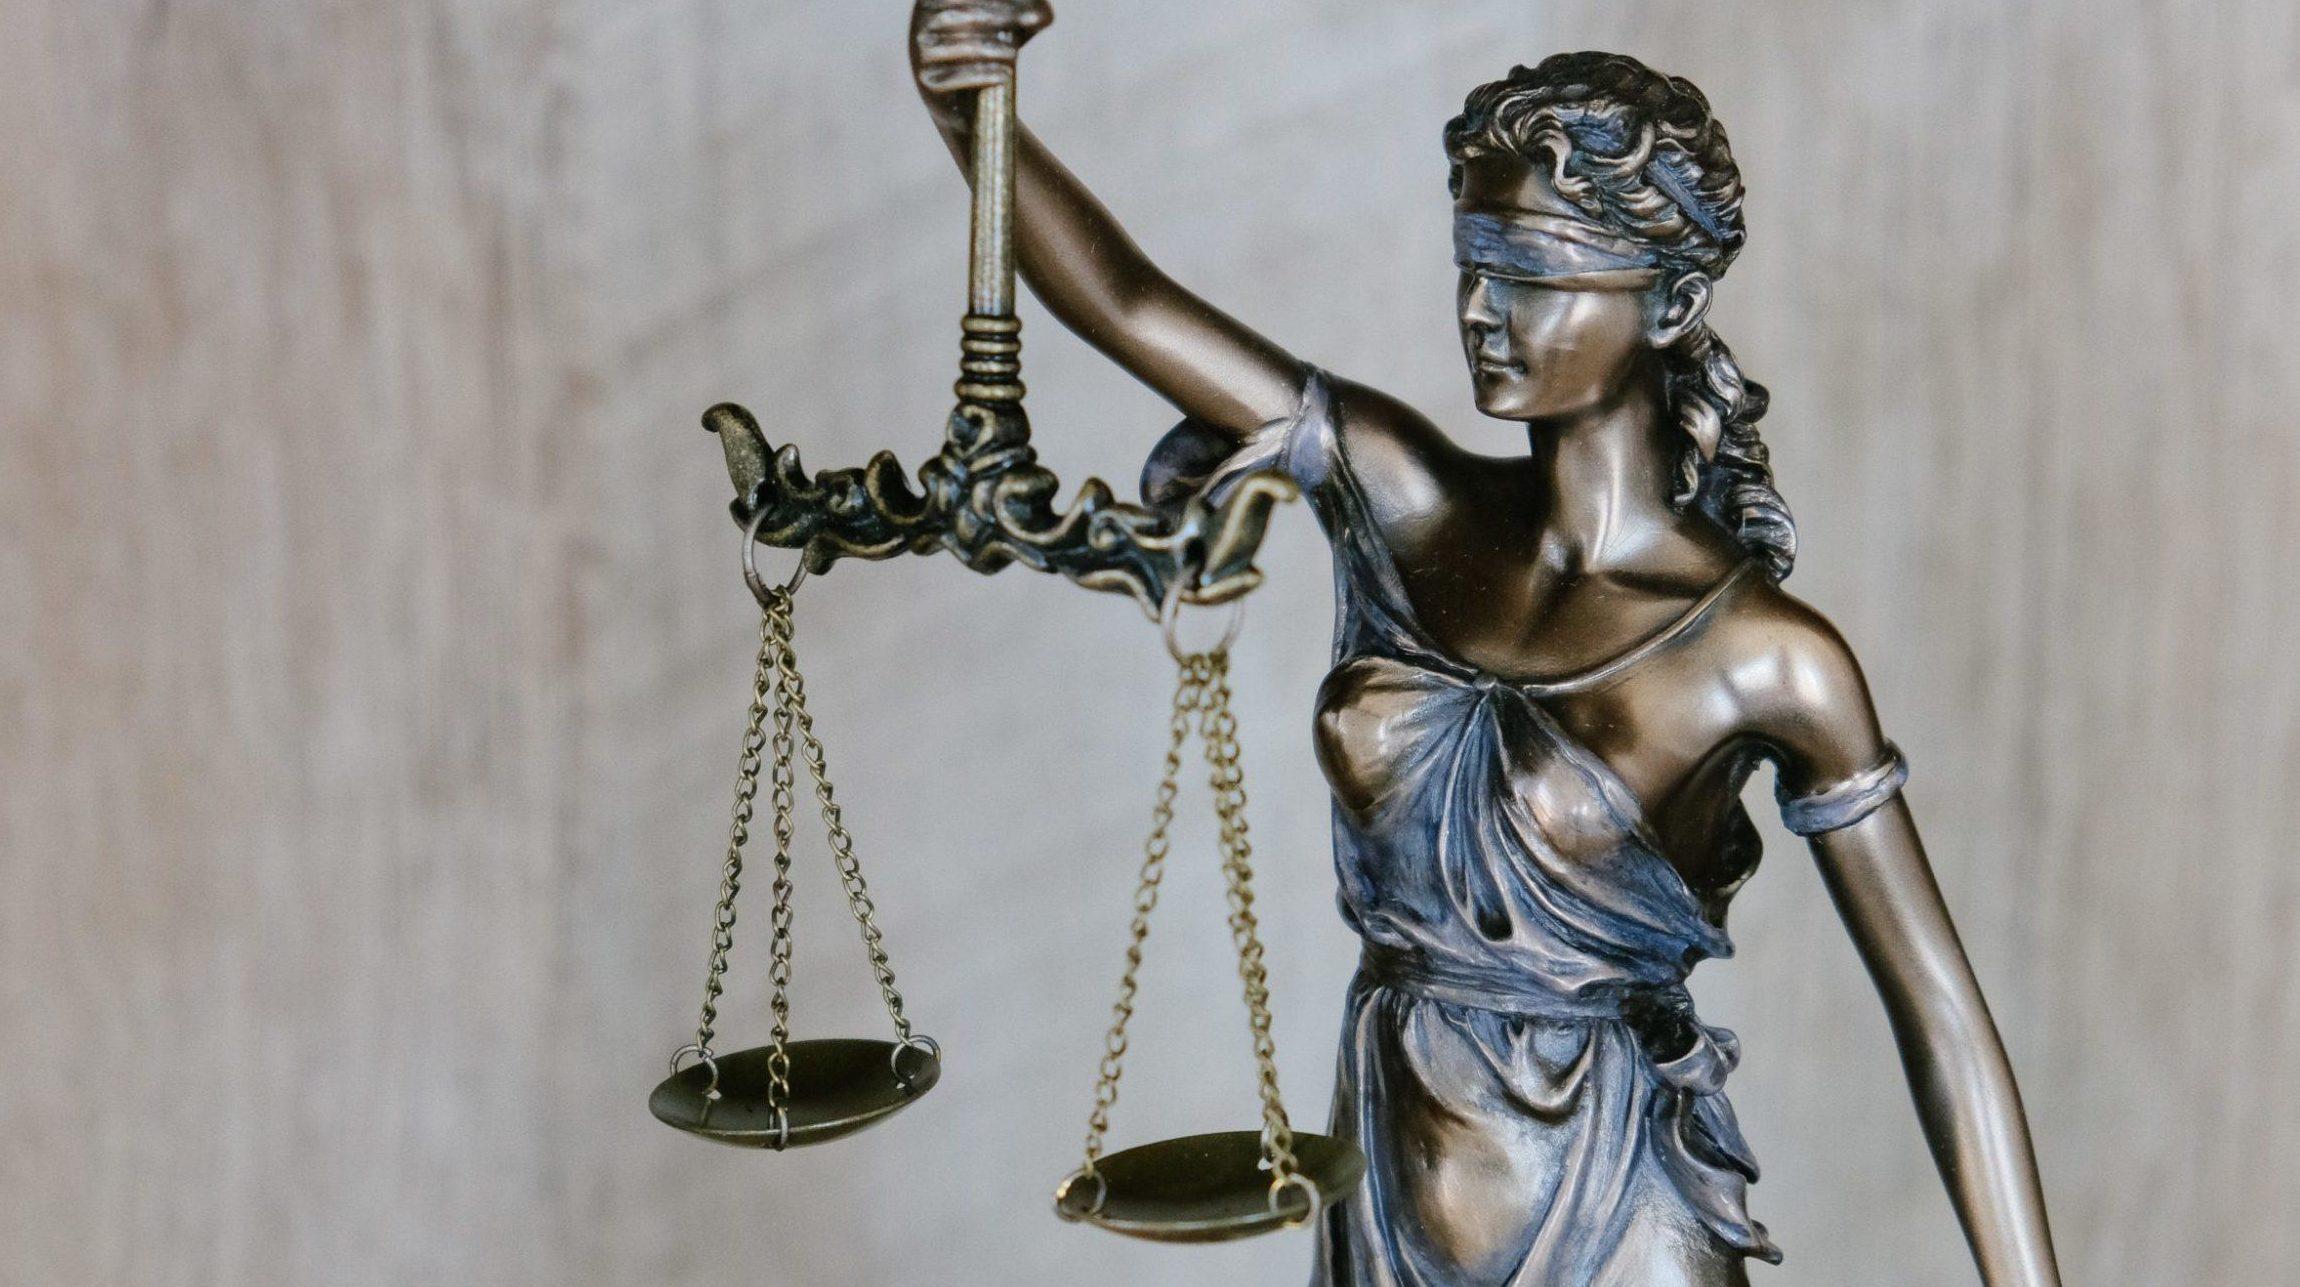 Unsplash/Tingey Injury Law Firm